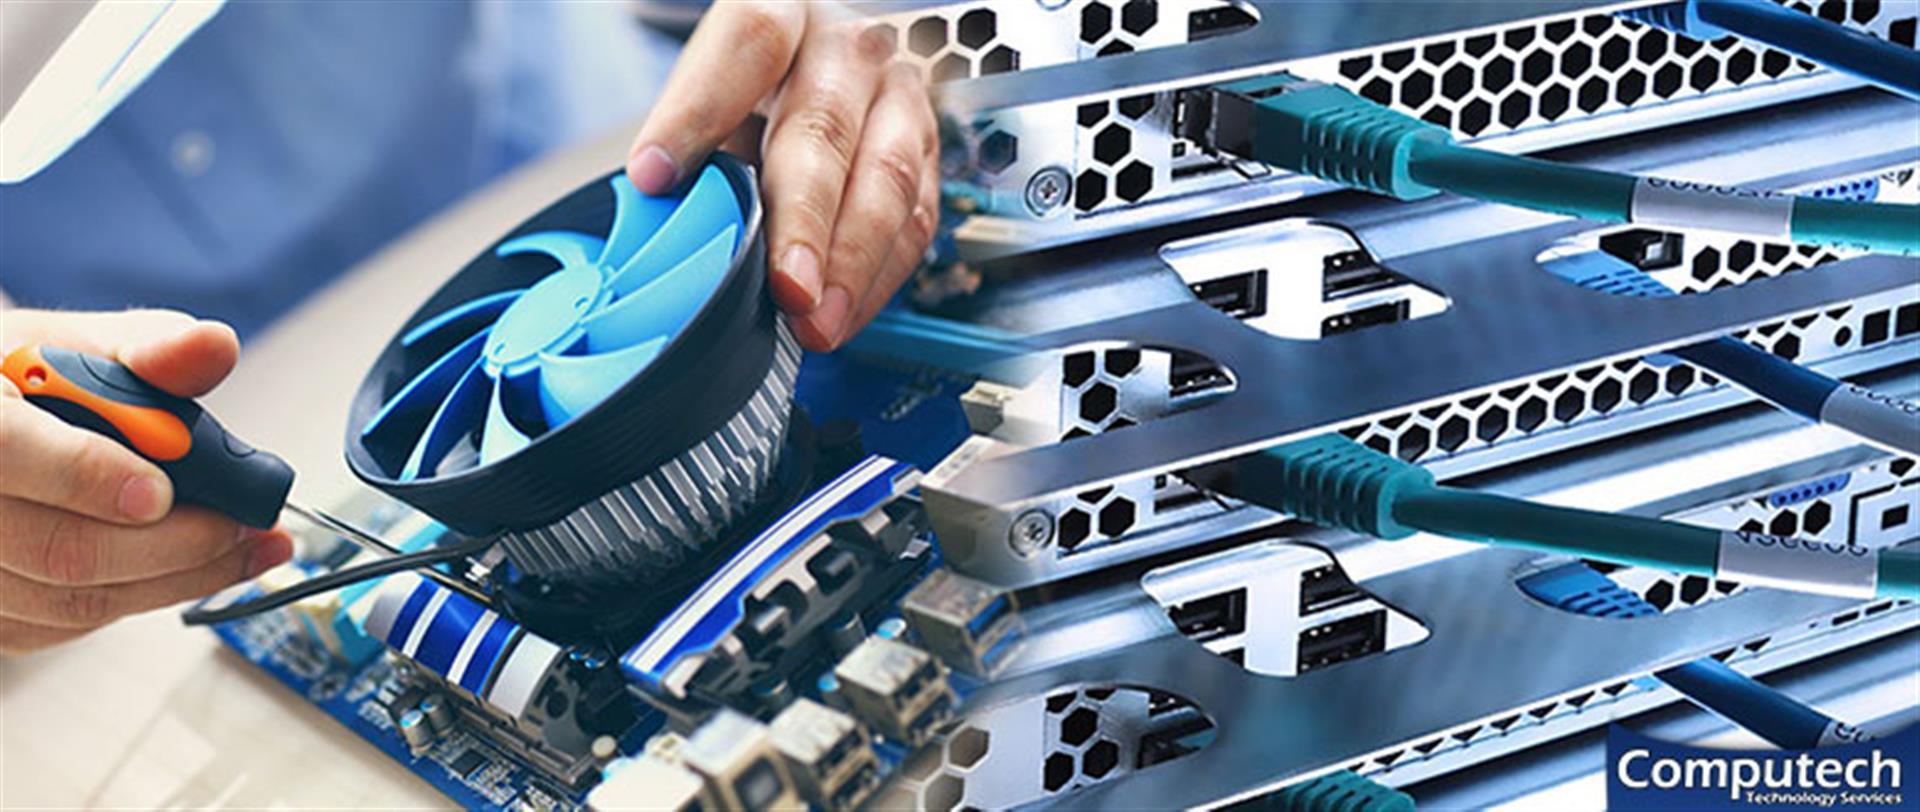 Shenandoah Virginia Onsite PC & Printer Repair, Networks, Voice & Data Cabling Solutions